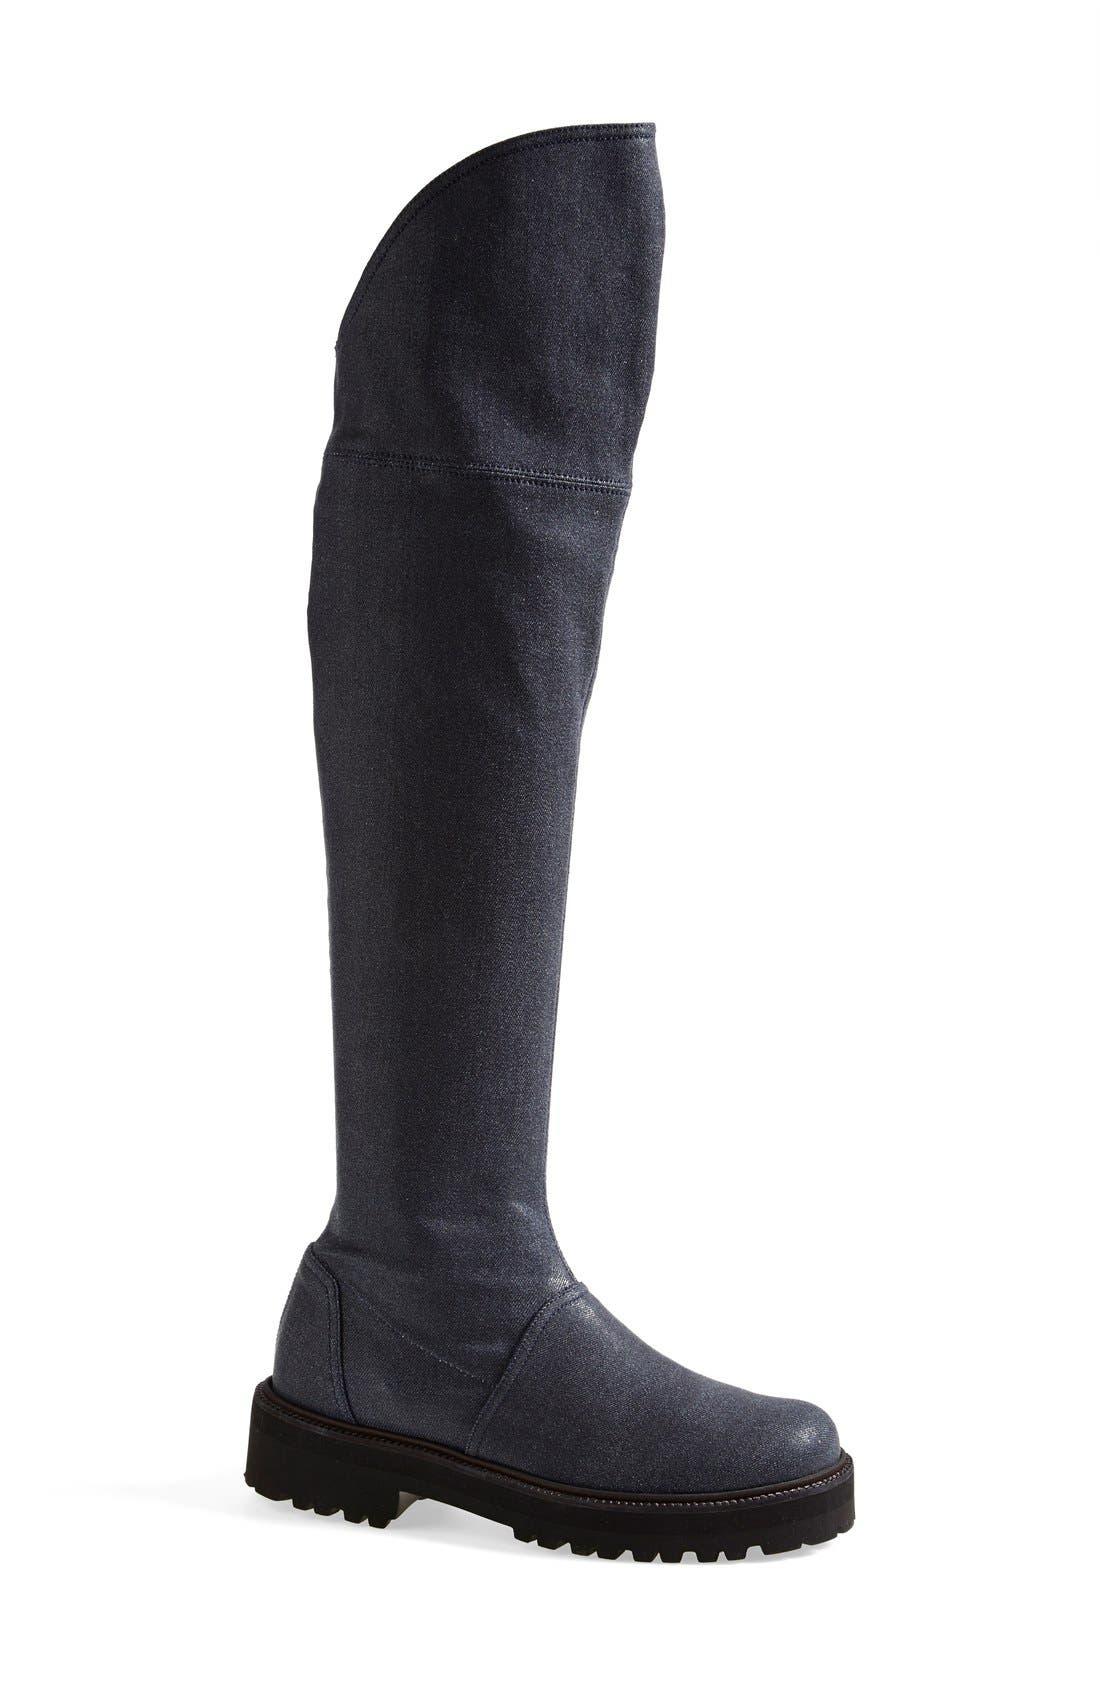 Alternate Image 1 Selected - MM6 Maison Margiela Over the Knee Boot (Women)